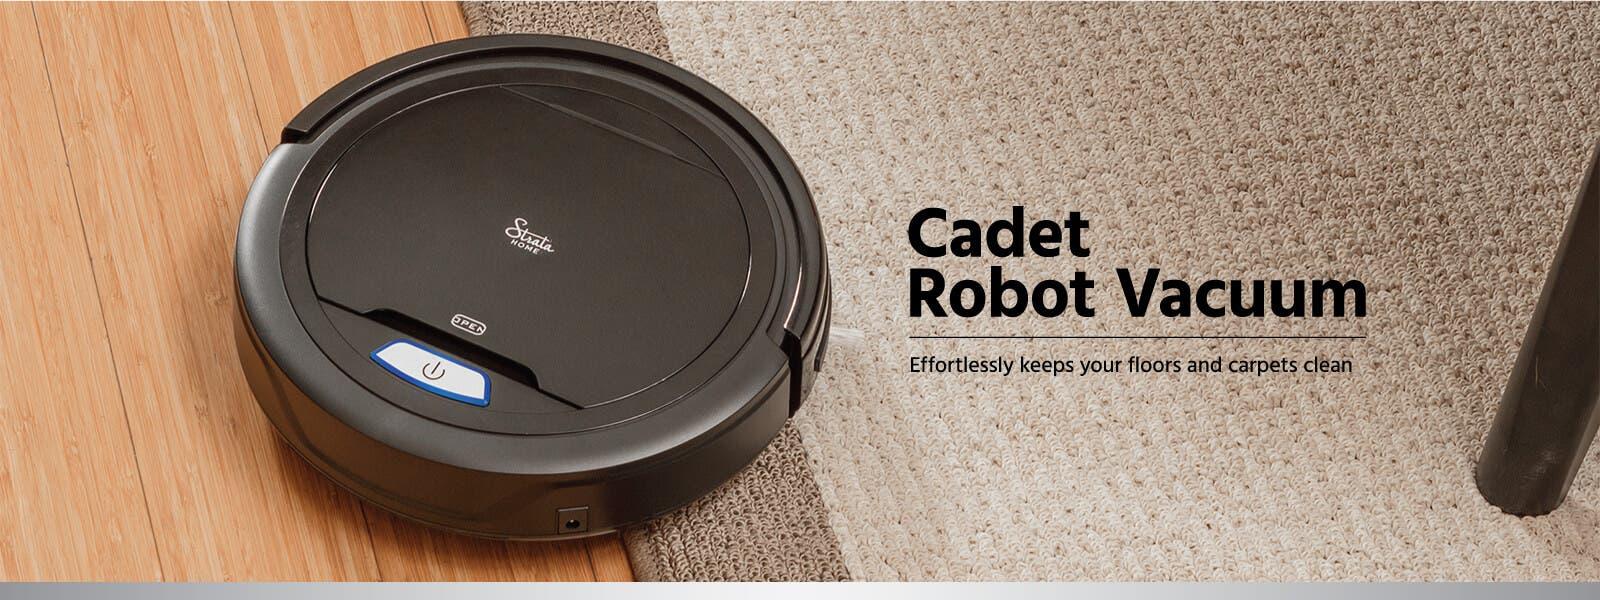 Cadet Robot Vacuum